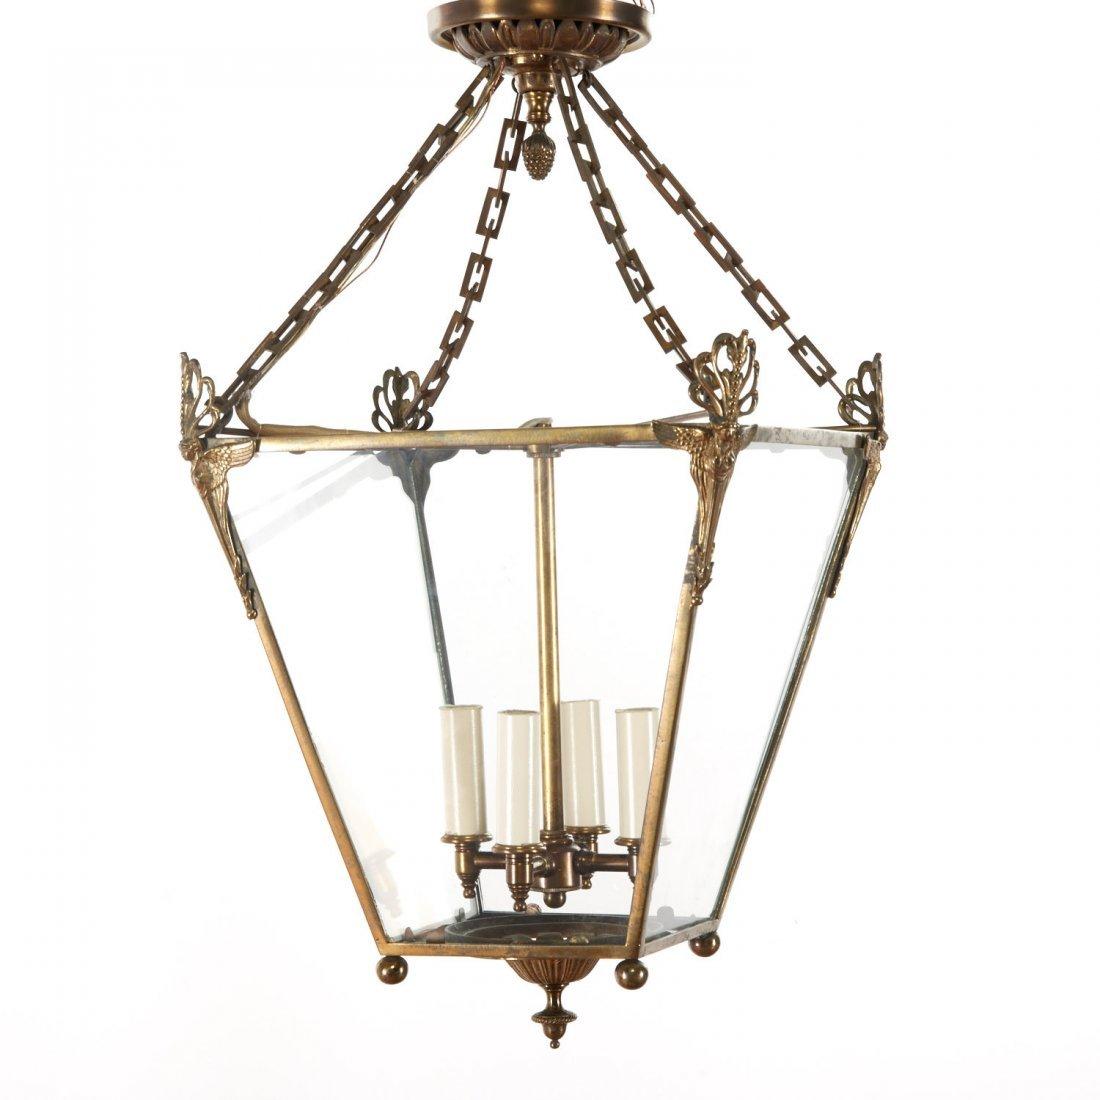 Neo-Classical style gilt metal hall lantern